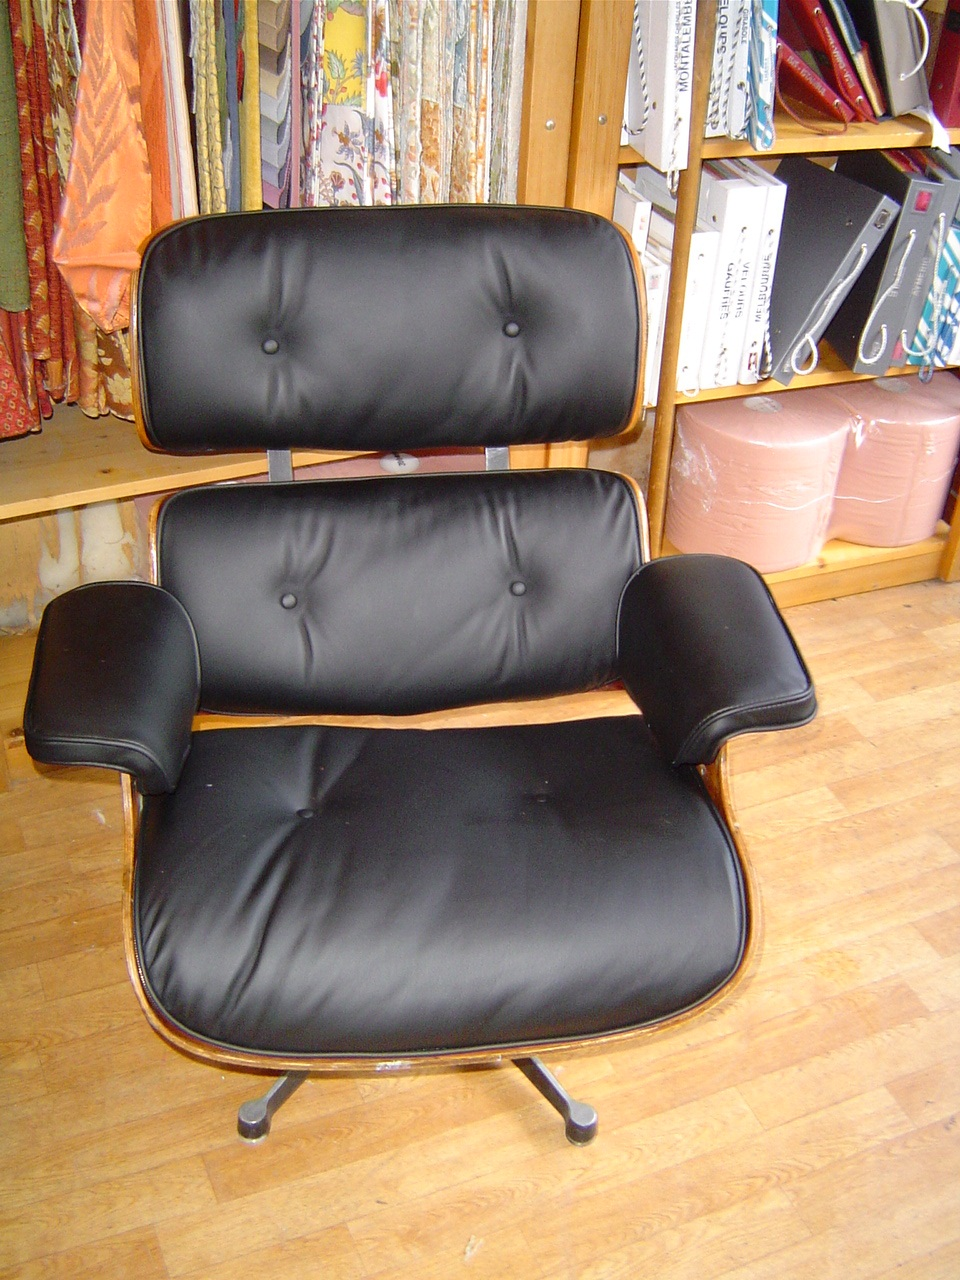 Etablissement fortun p re et fils sellerie fortun fauteuil charles - Fauteuil charles eames occasion ...